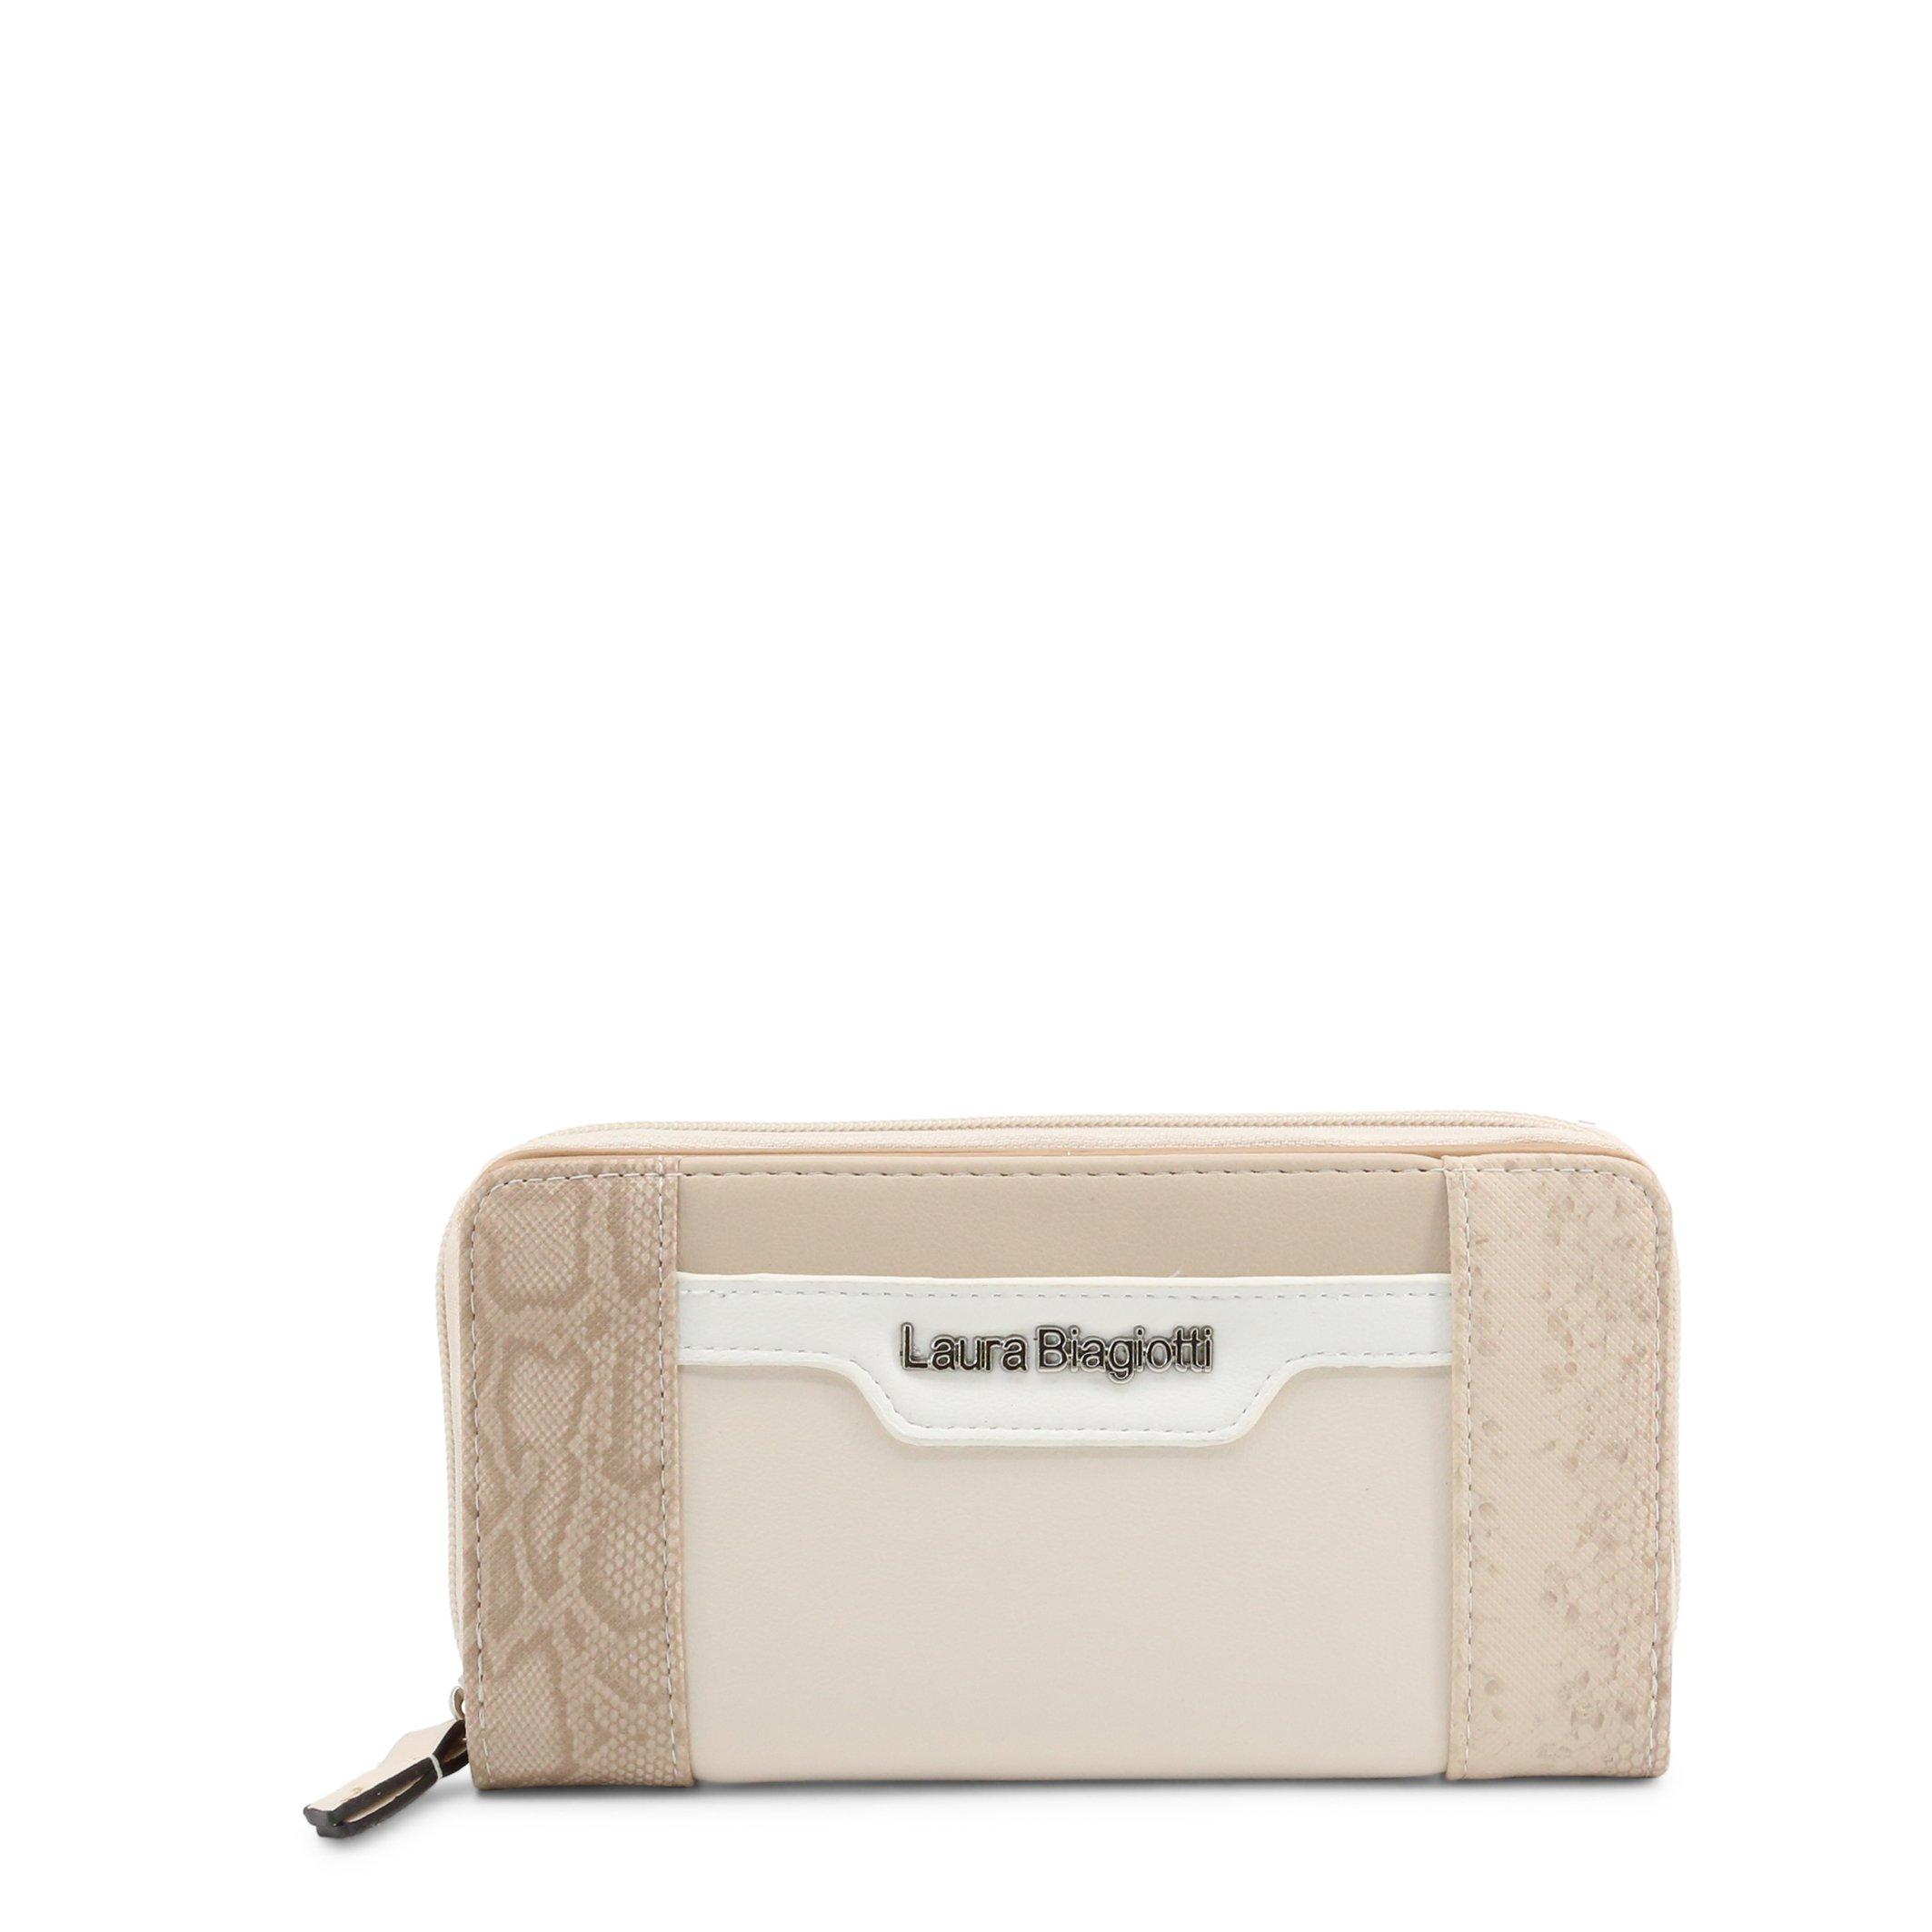 Laura Biagiotti Women's Wallet Various Colours Cortez_507-67 - brown NOSIZE